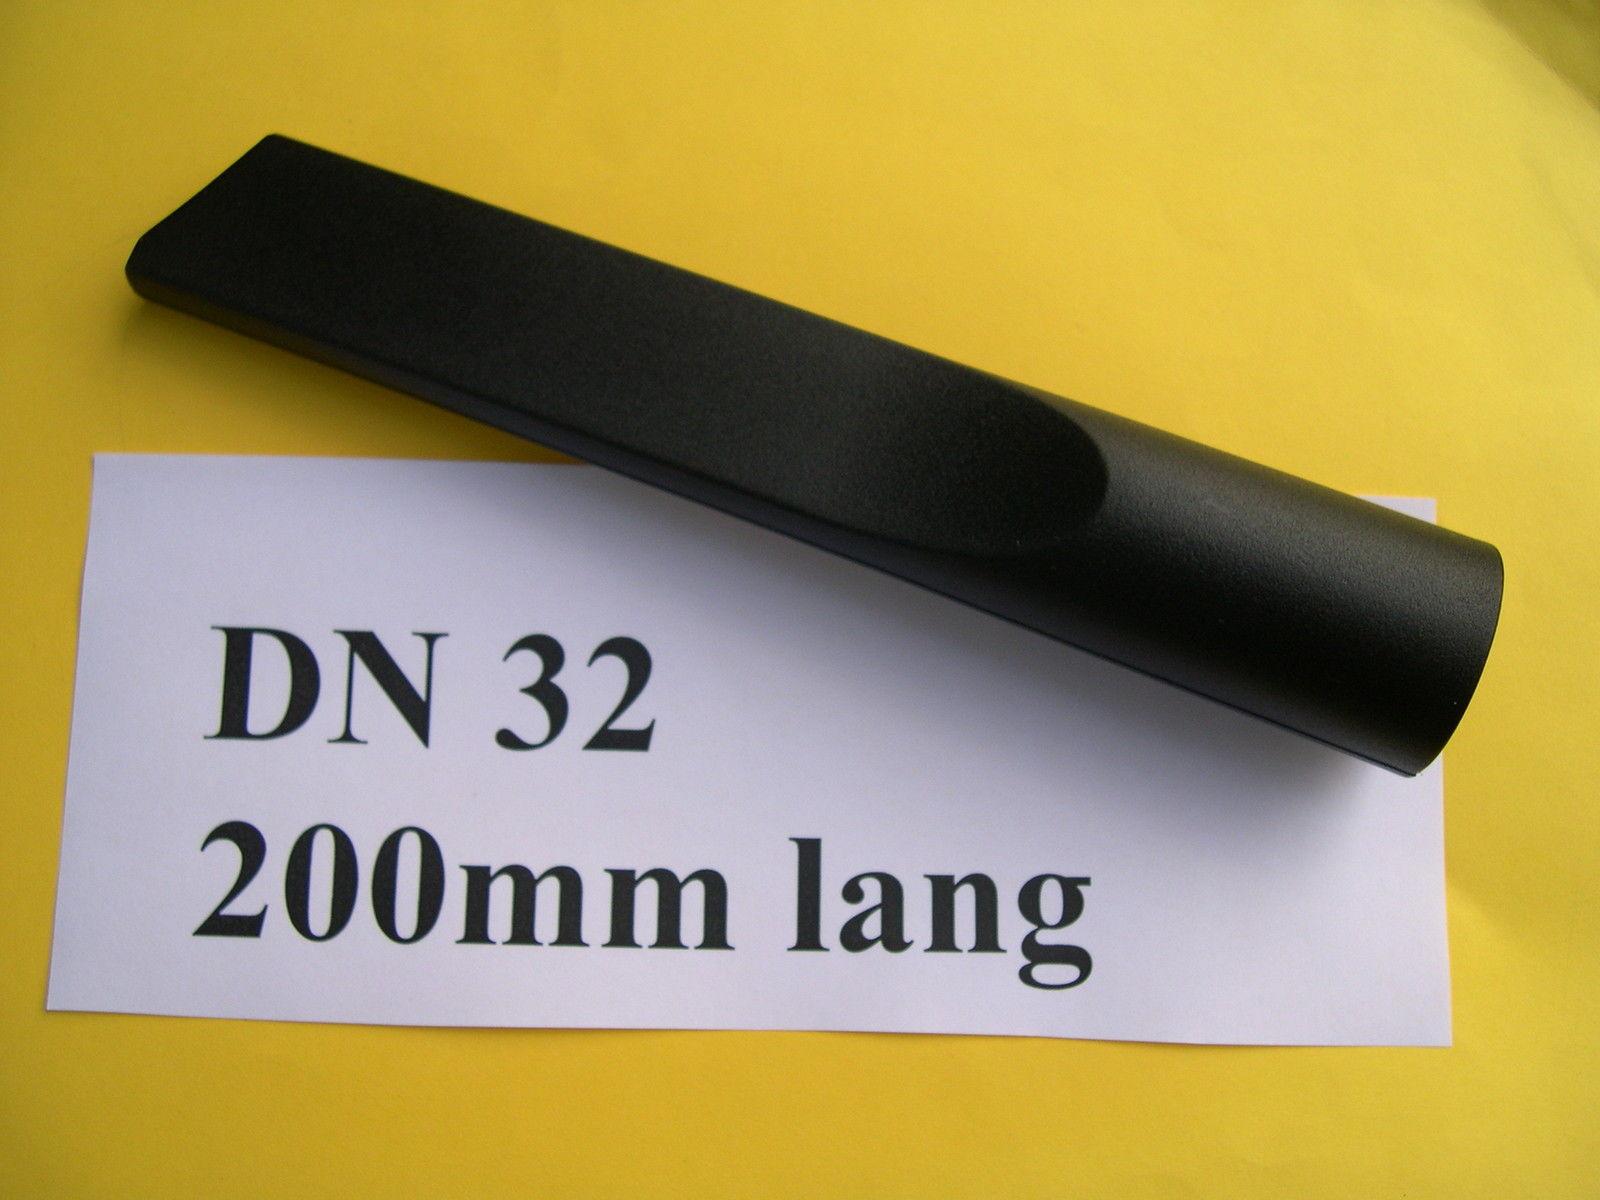 2 Stück Fugendüse DN32 Saugdüse für Staubsauger Industriesauger NT Sauger